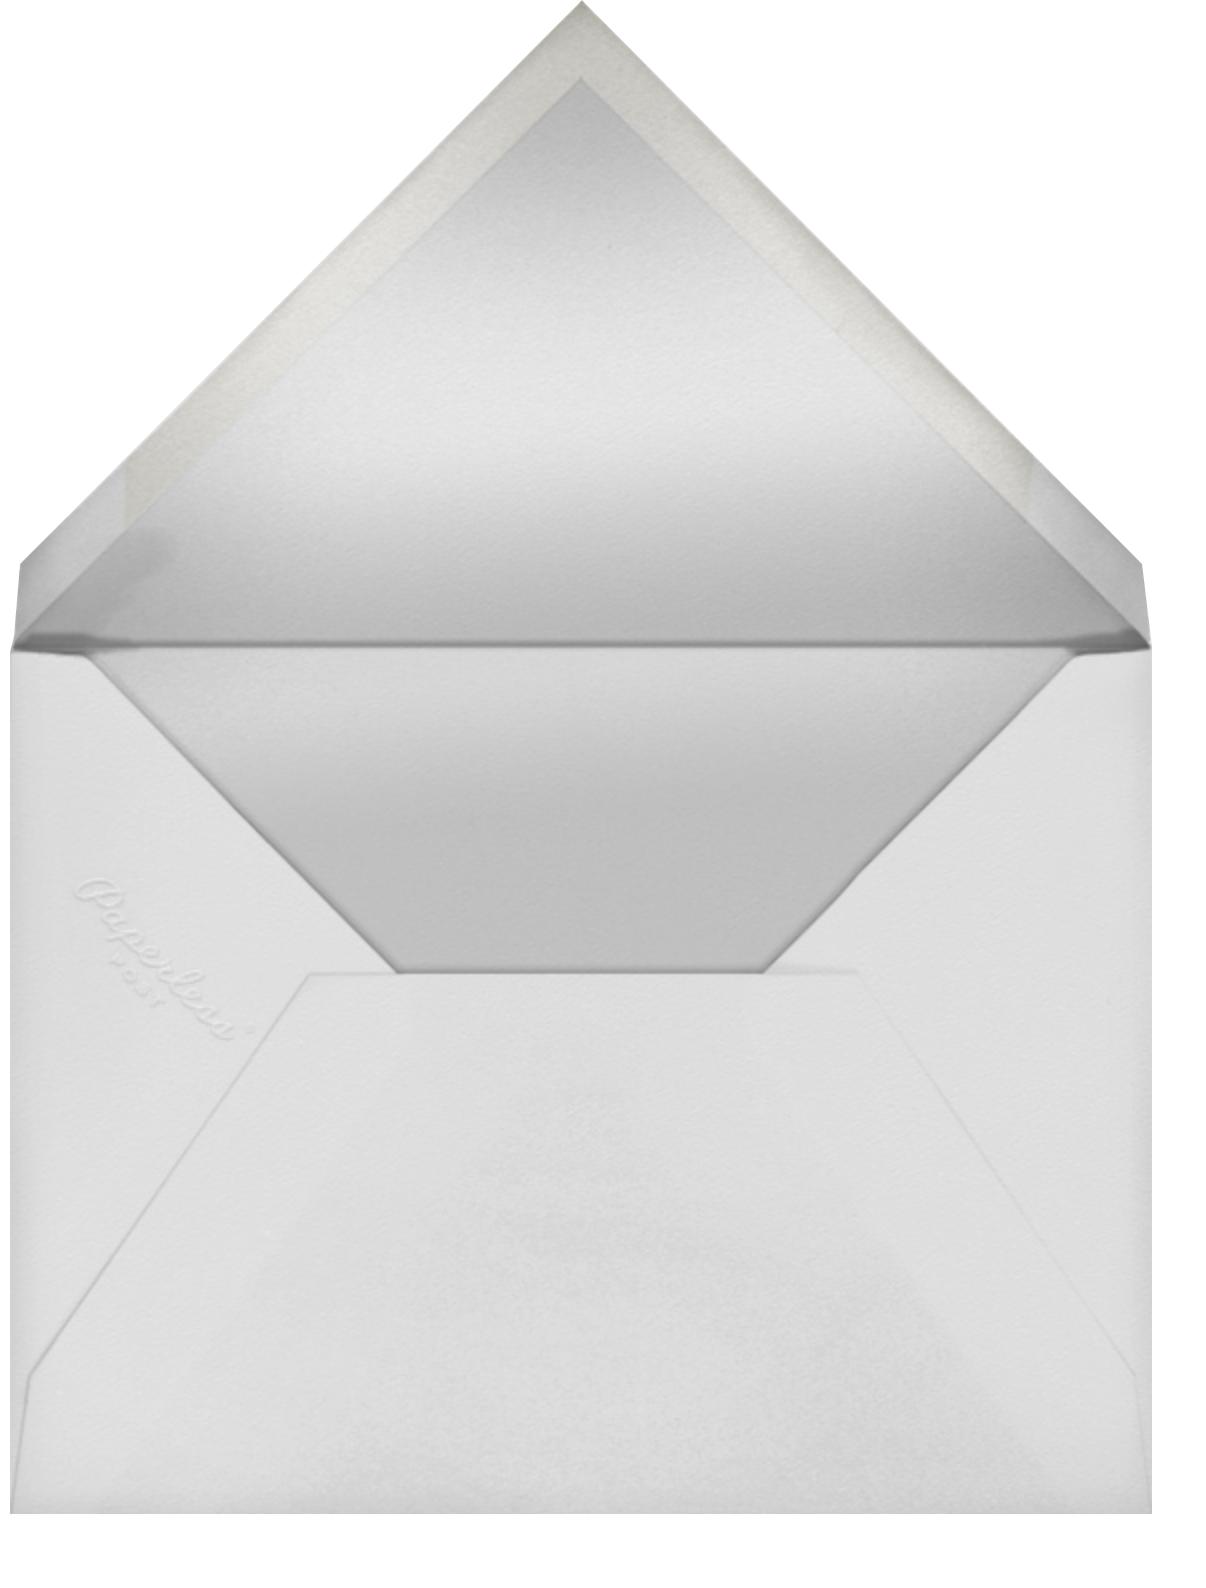 Plume (Menu) - White/Gold - Paperless Post - Menus and programs - envelope back